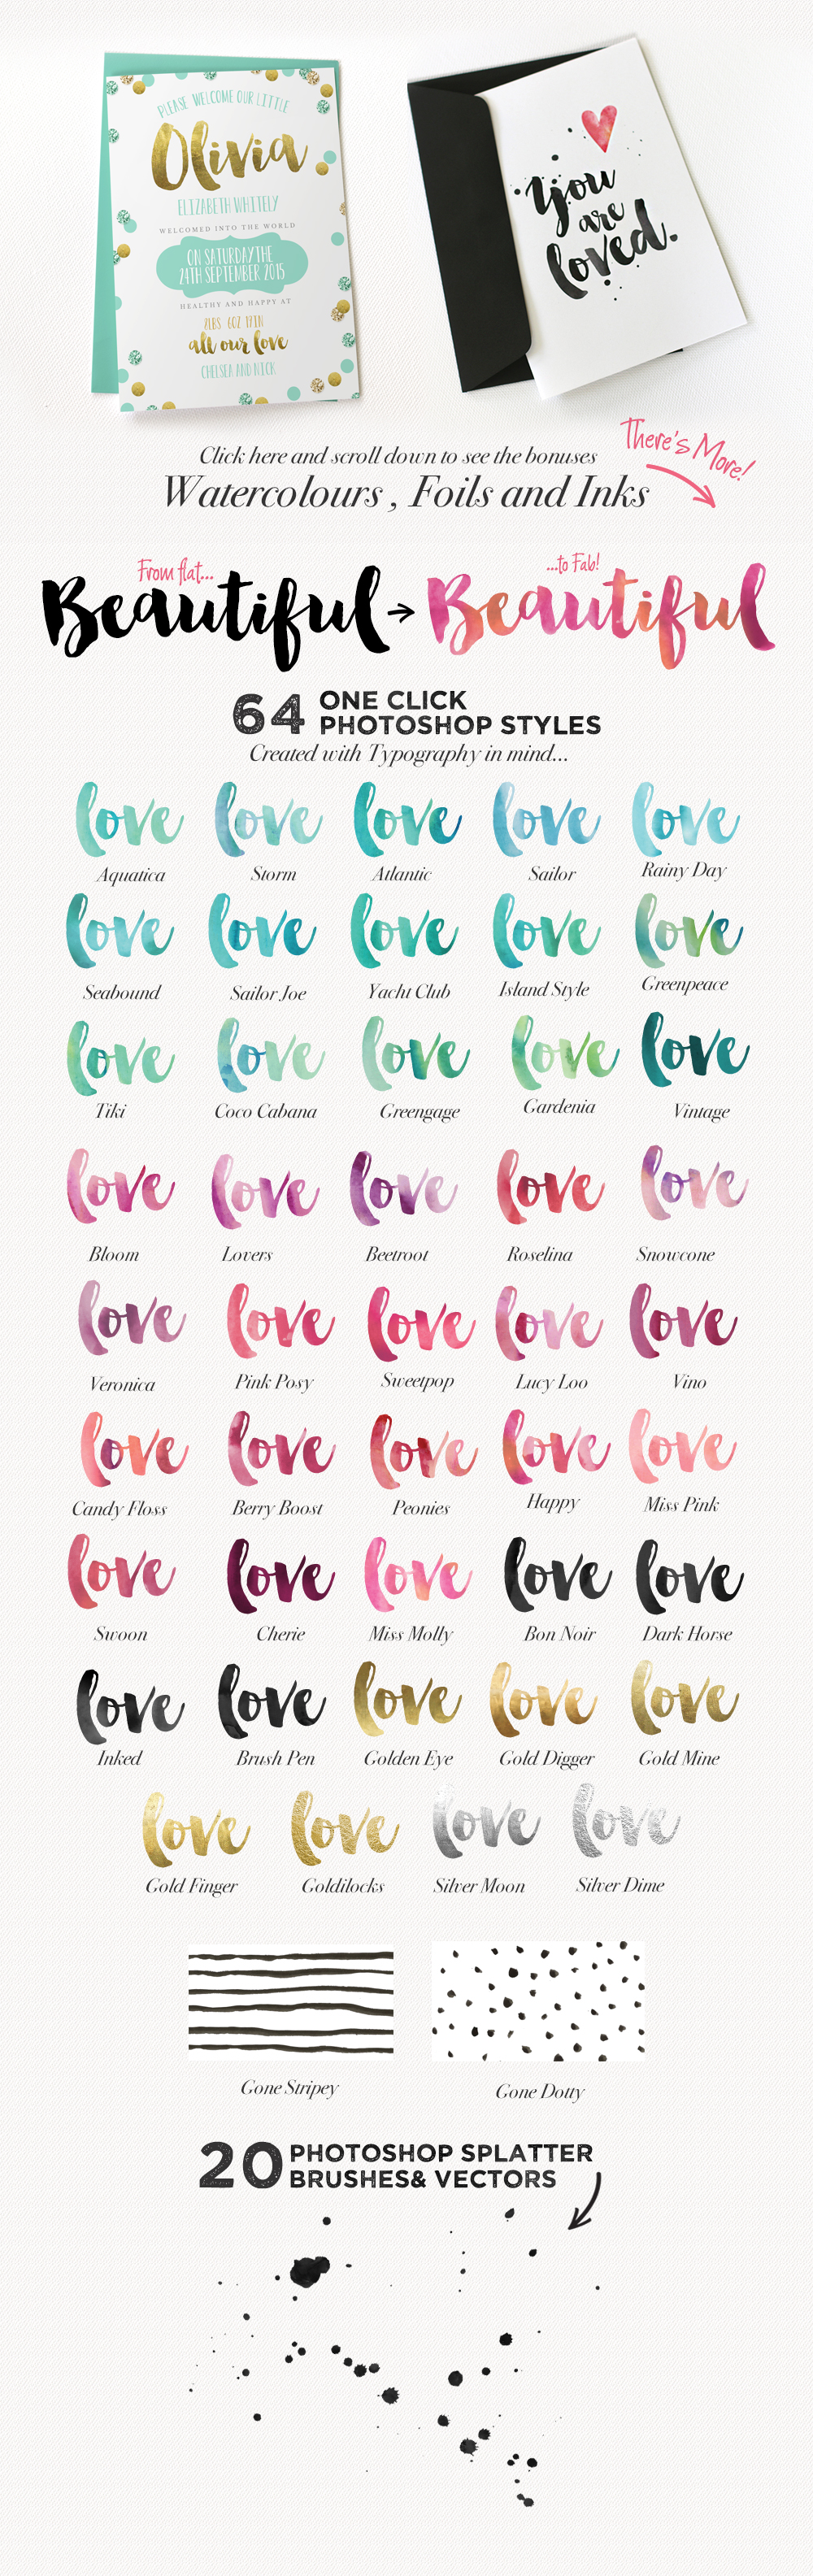 A beautiful font!!